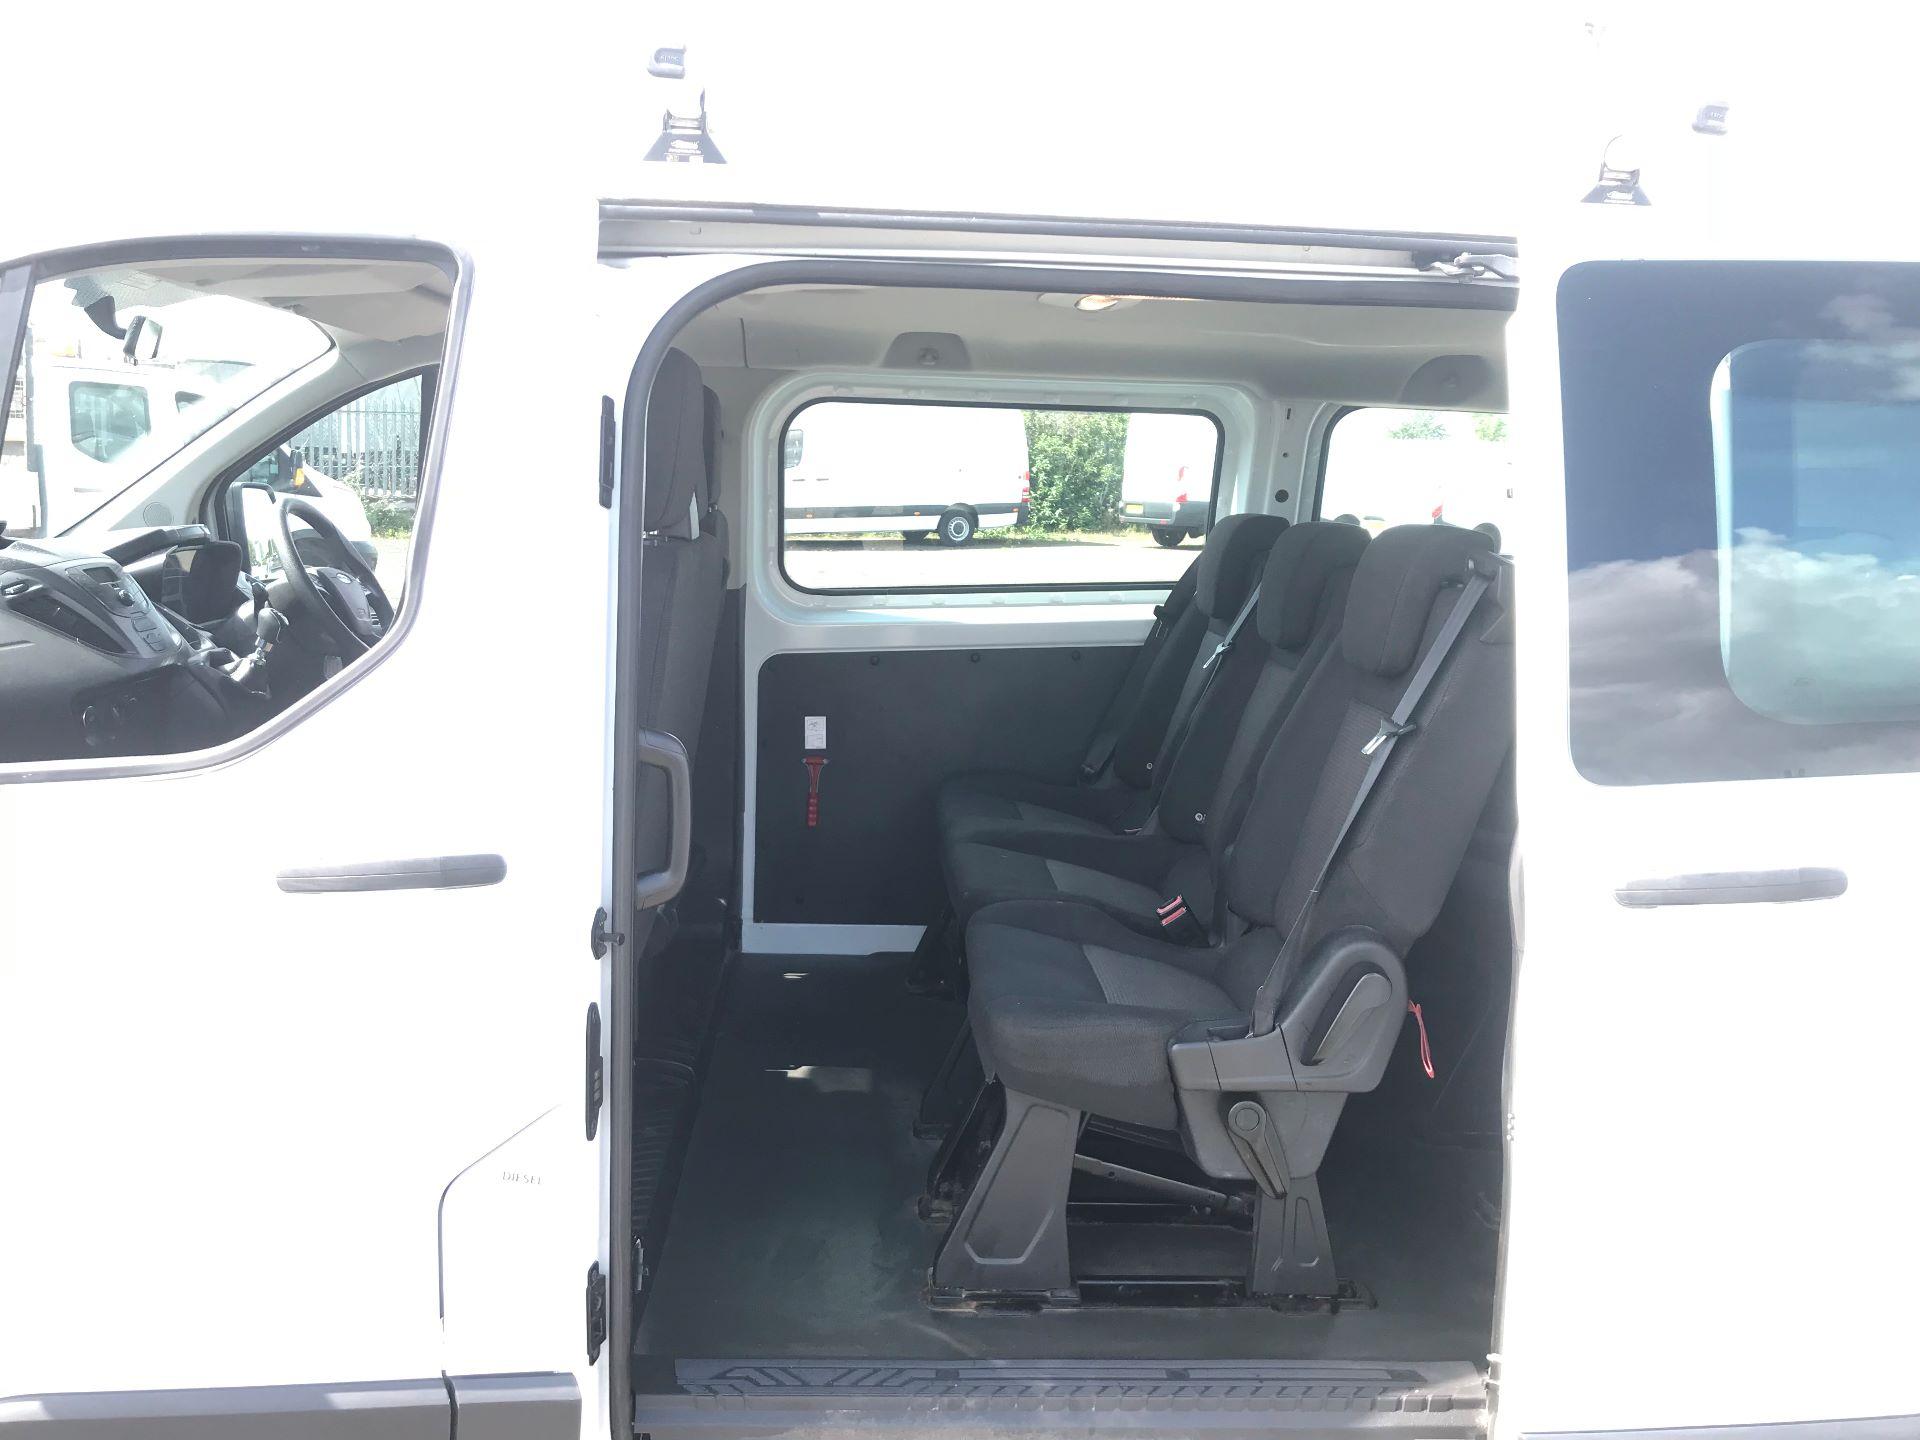 2014 Ford Transit Custom 310  L2 DIESEL FWD 2.2 TDCI 125PS LOW ROOF KOMBI VAN EURO 5 VAT INC (ND14OCH) Image 13